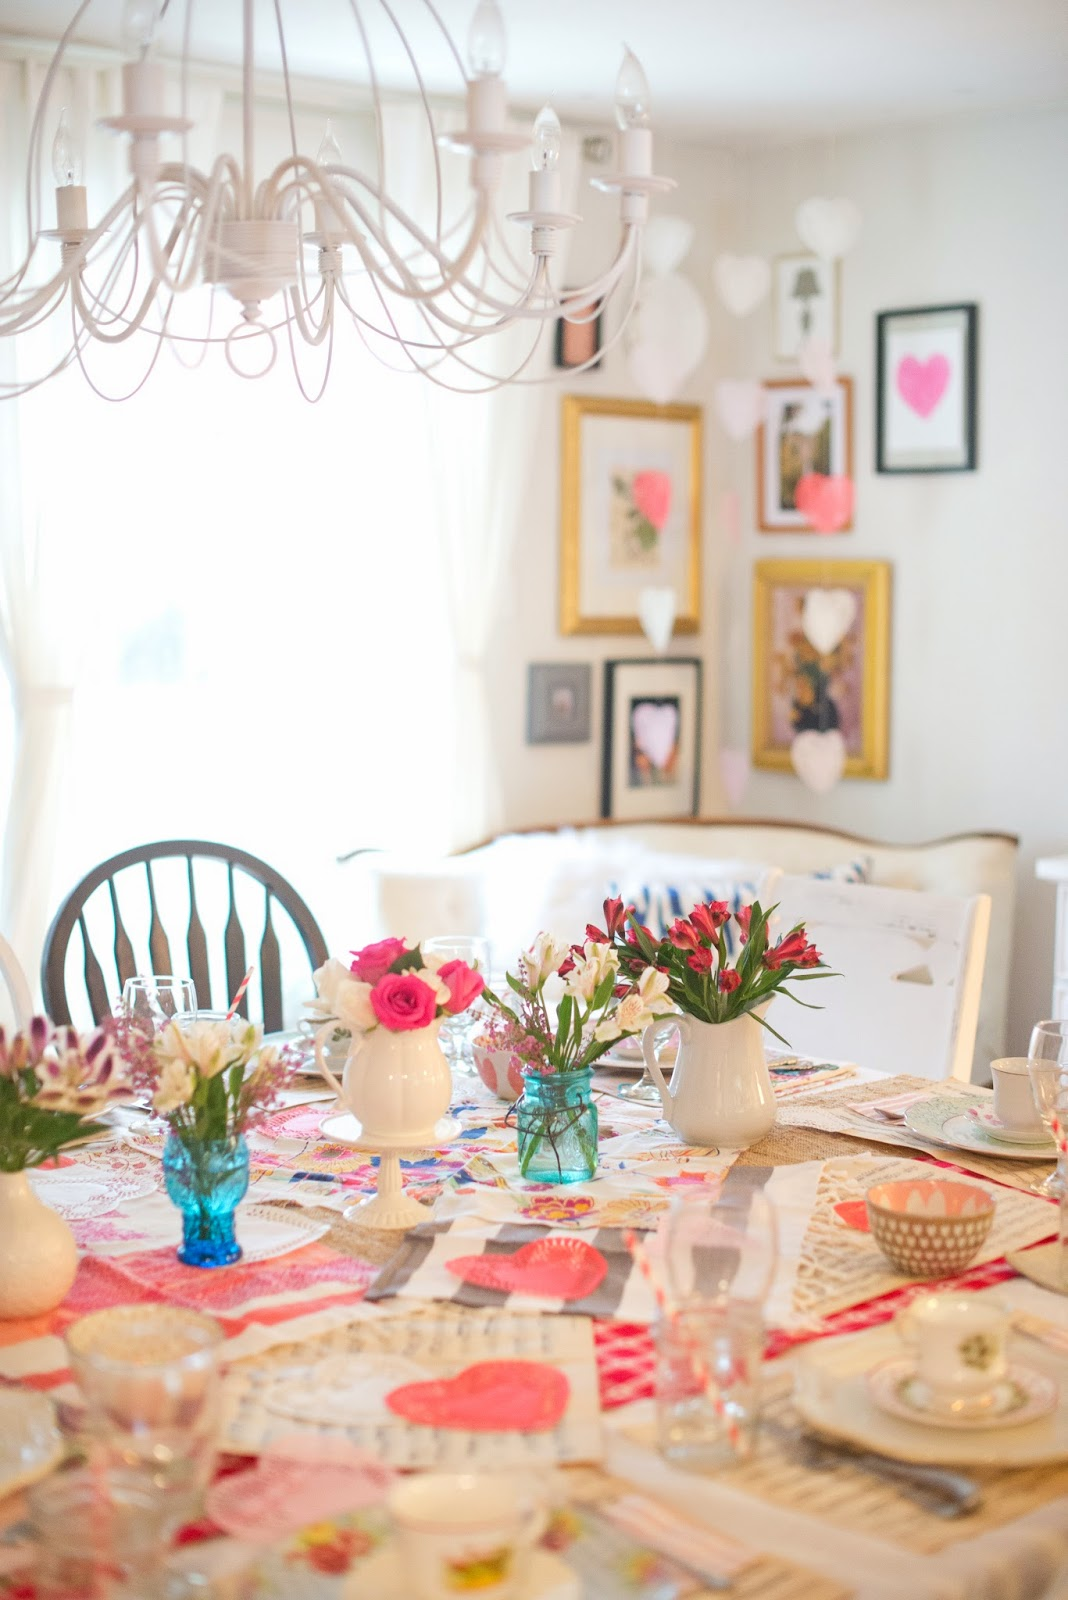 Декор стола цветами на день святого валентина